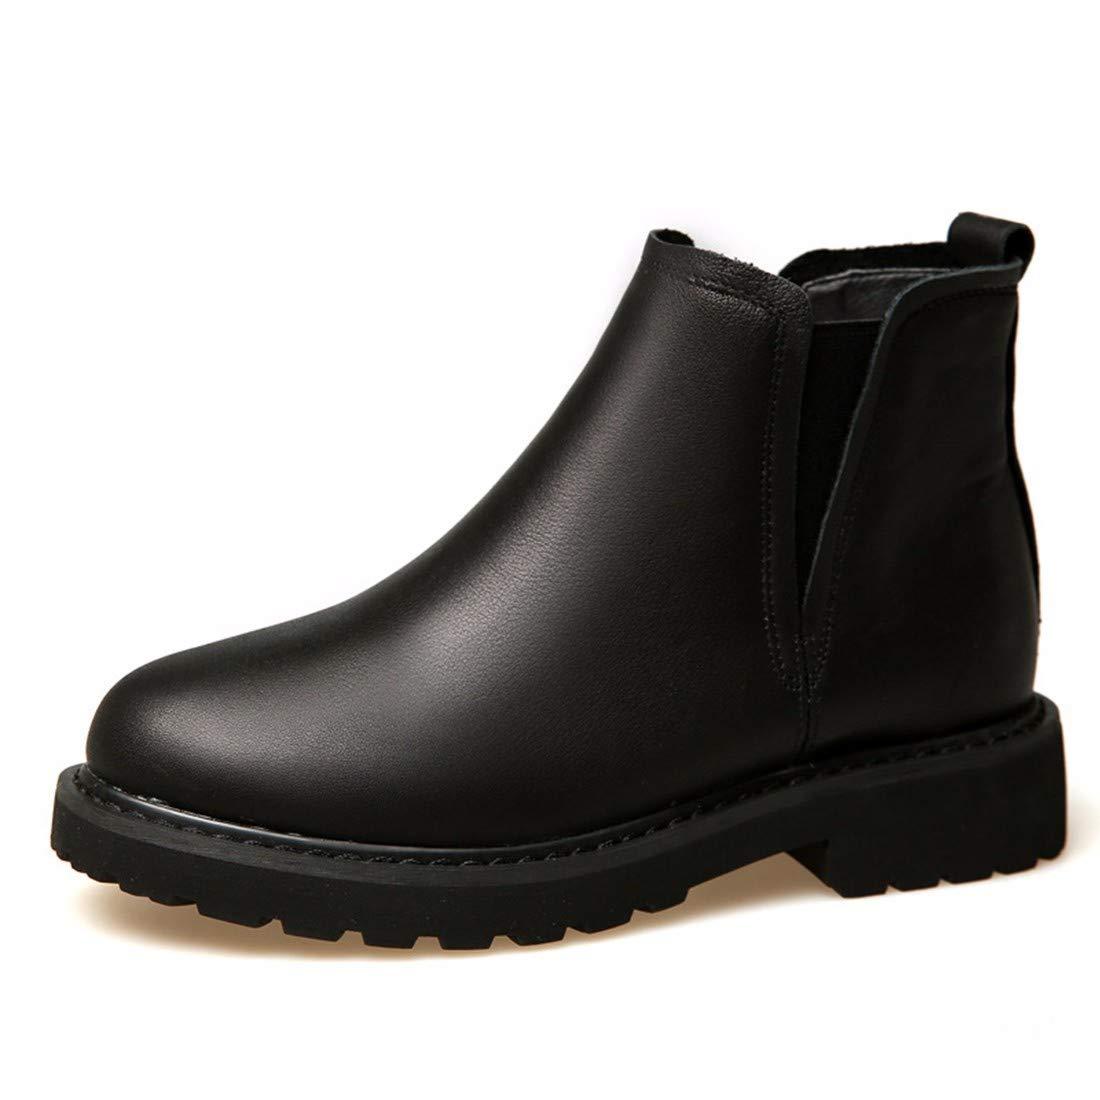 BeatinToes Damen Winter Warm Anti Slip Wasserdicht Naturleder Martin Stiefel Square Ferse Casual Schuhe Reine Farbe Kurze Stiefel